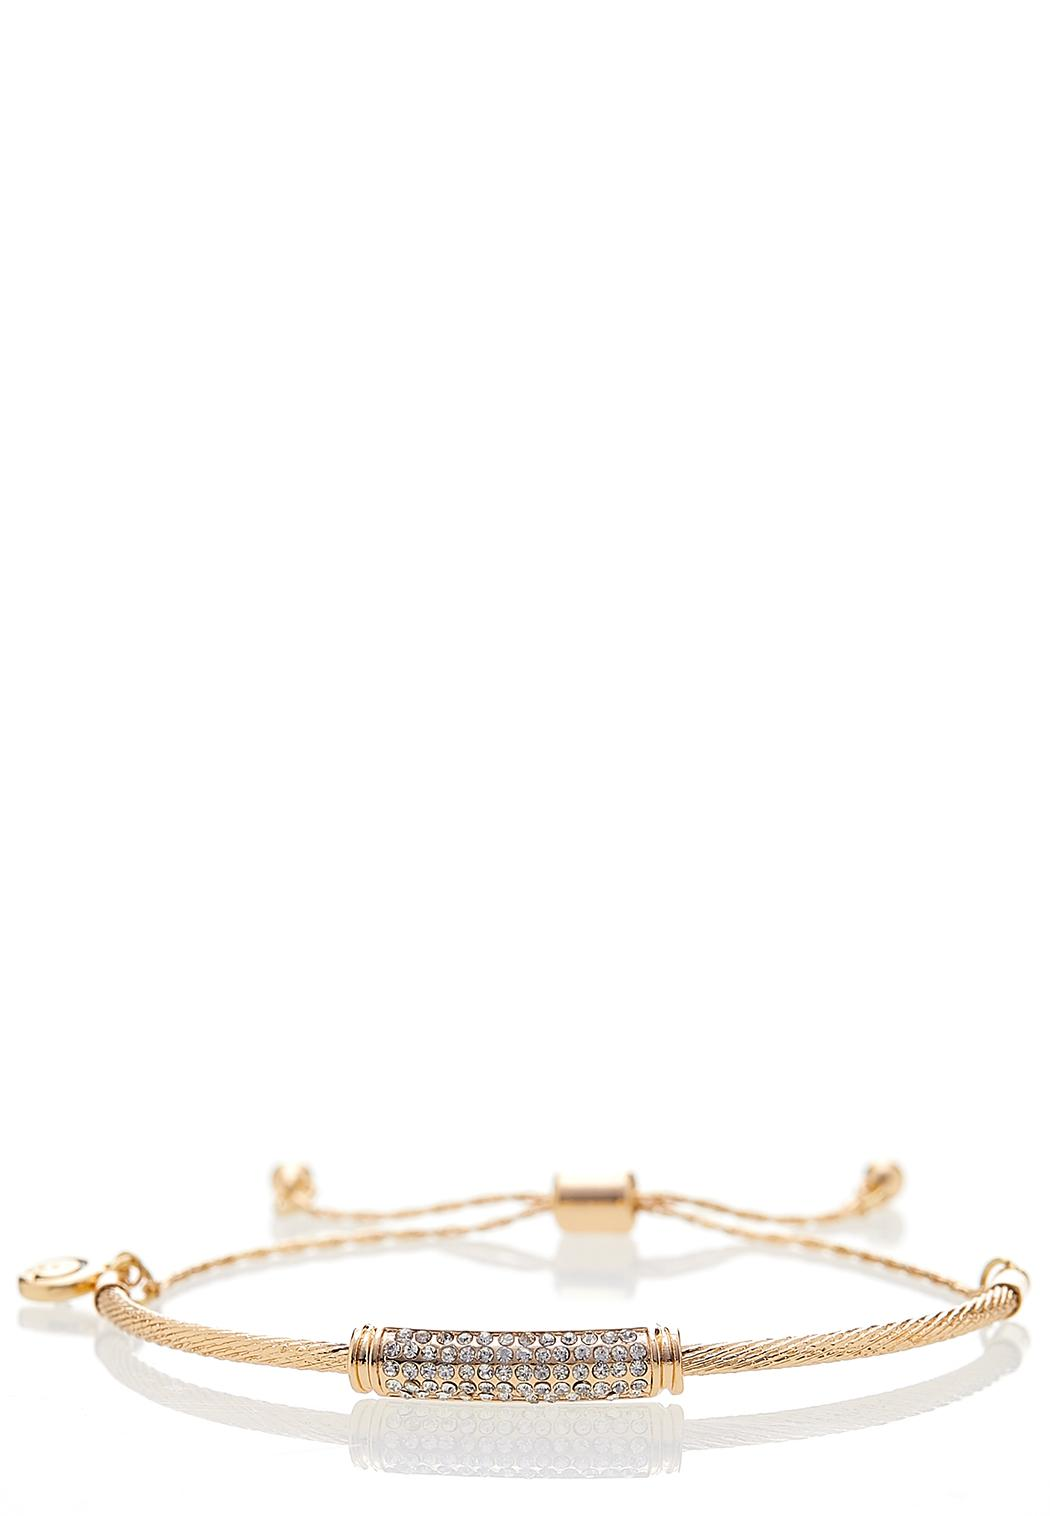 Delicate Stone Pull-String Bracelet